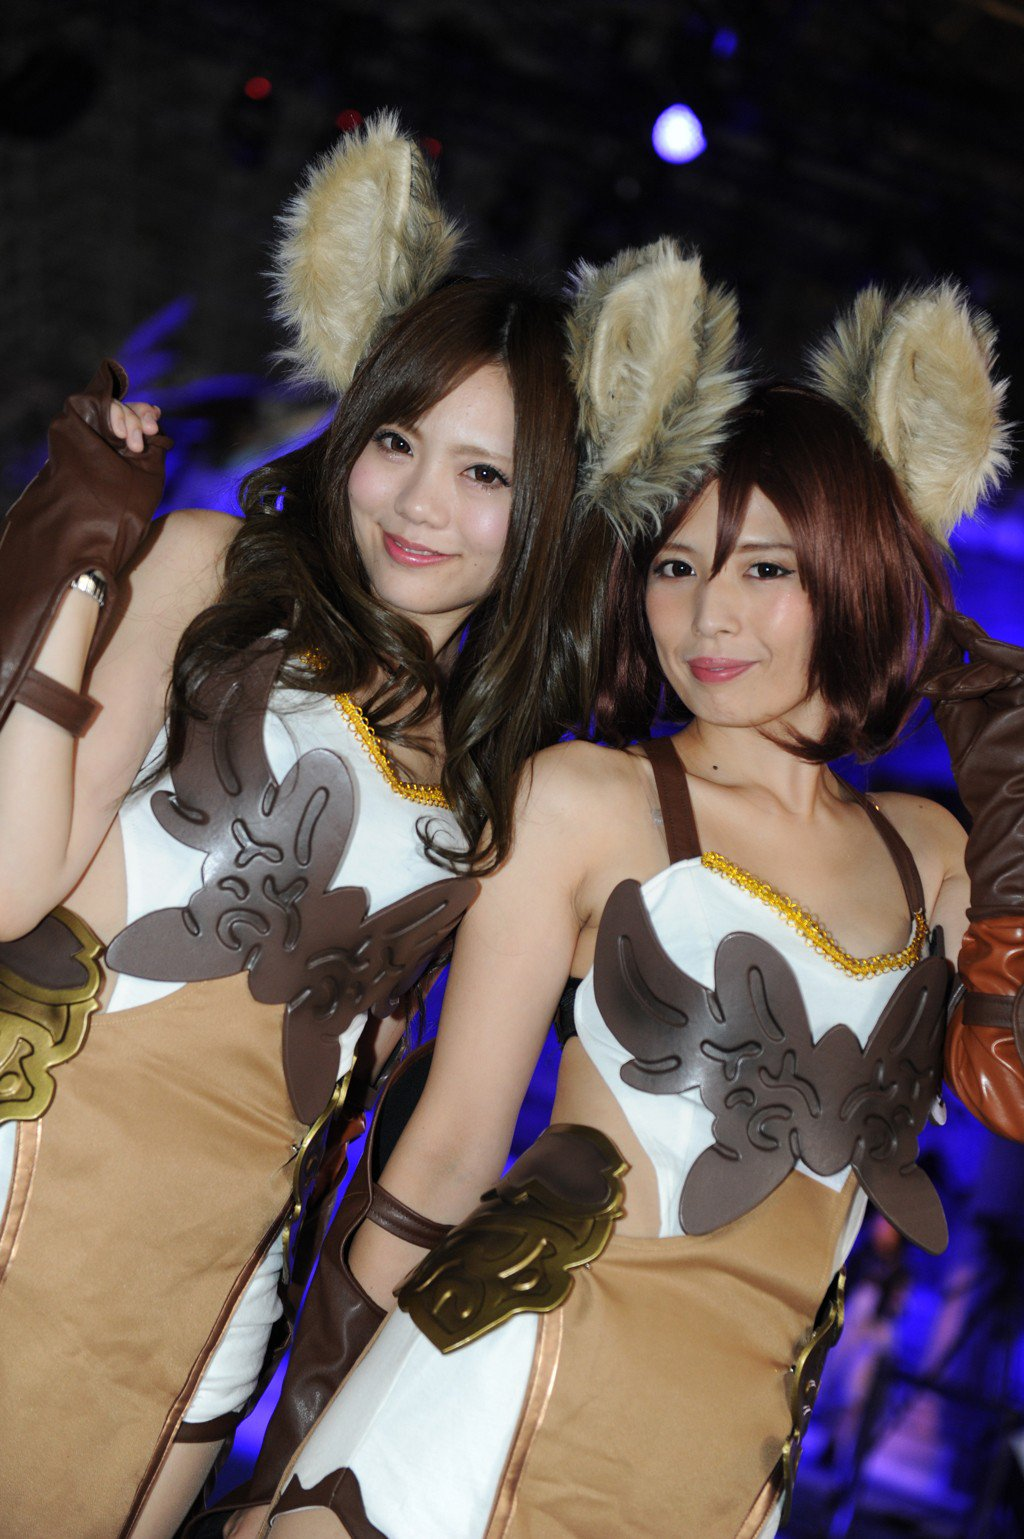 TGS えろ写真☆東京GAMEショーはセックスなコンパニオンがコスプレしててレイヤーよりレベル高くてぐうシコwwwwwwwwww